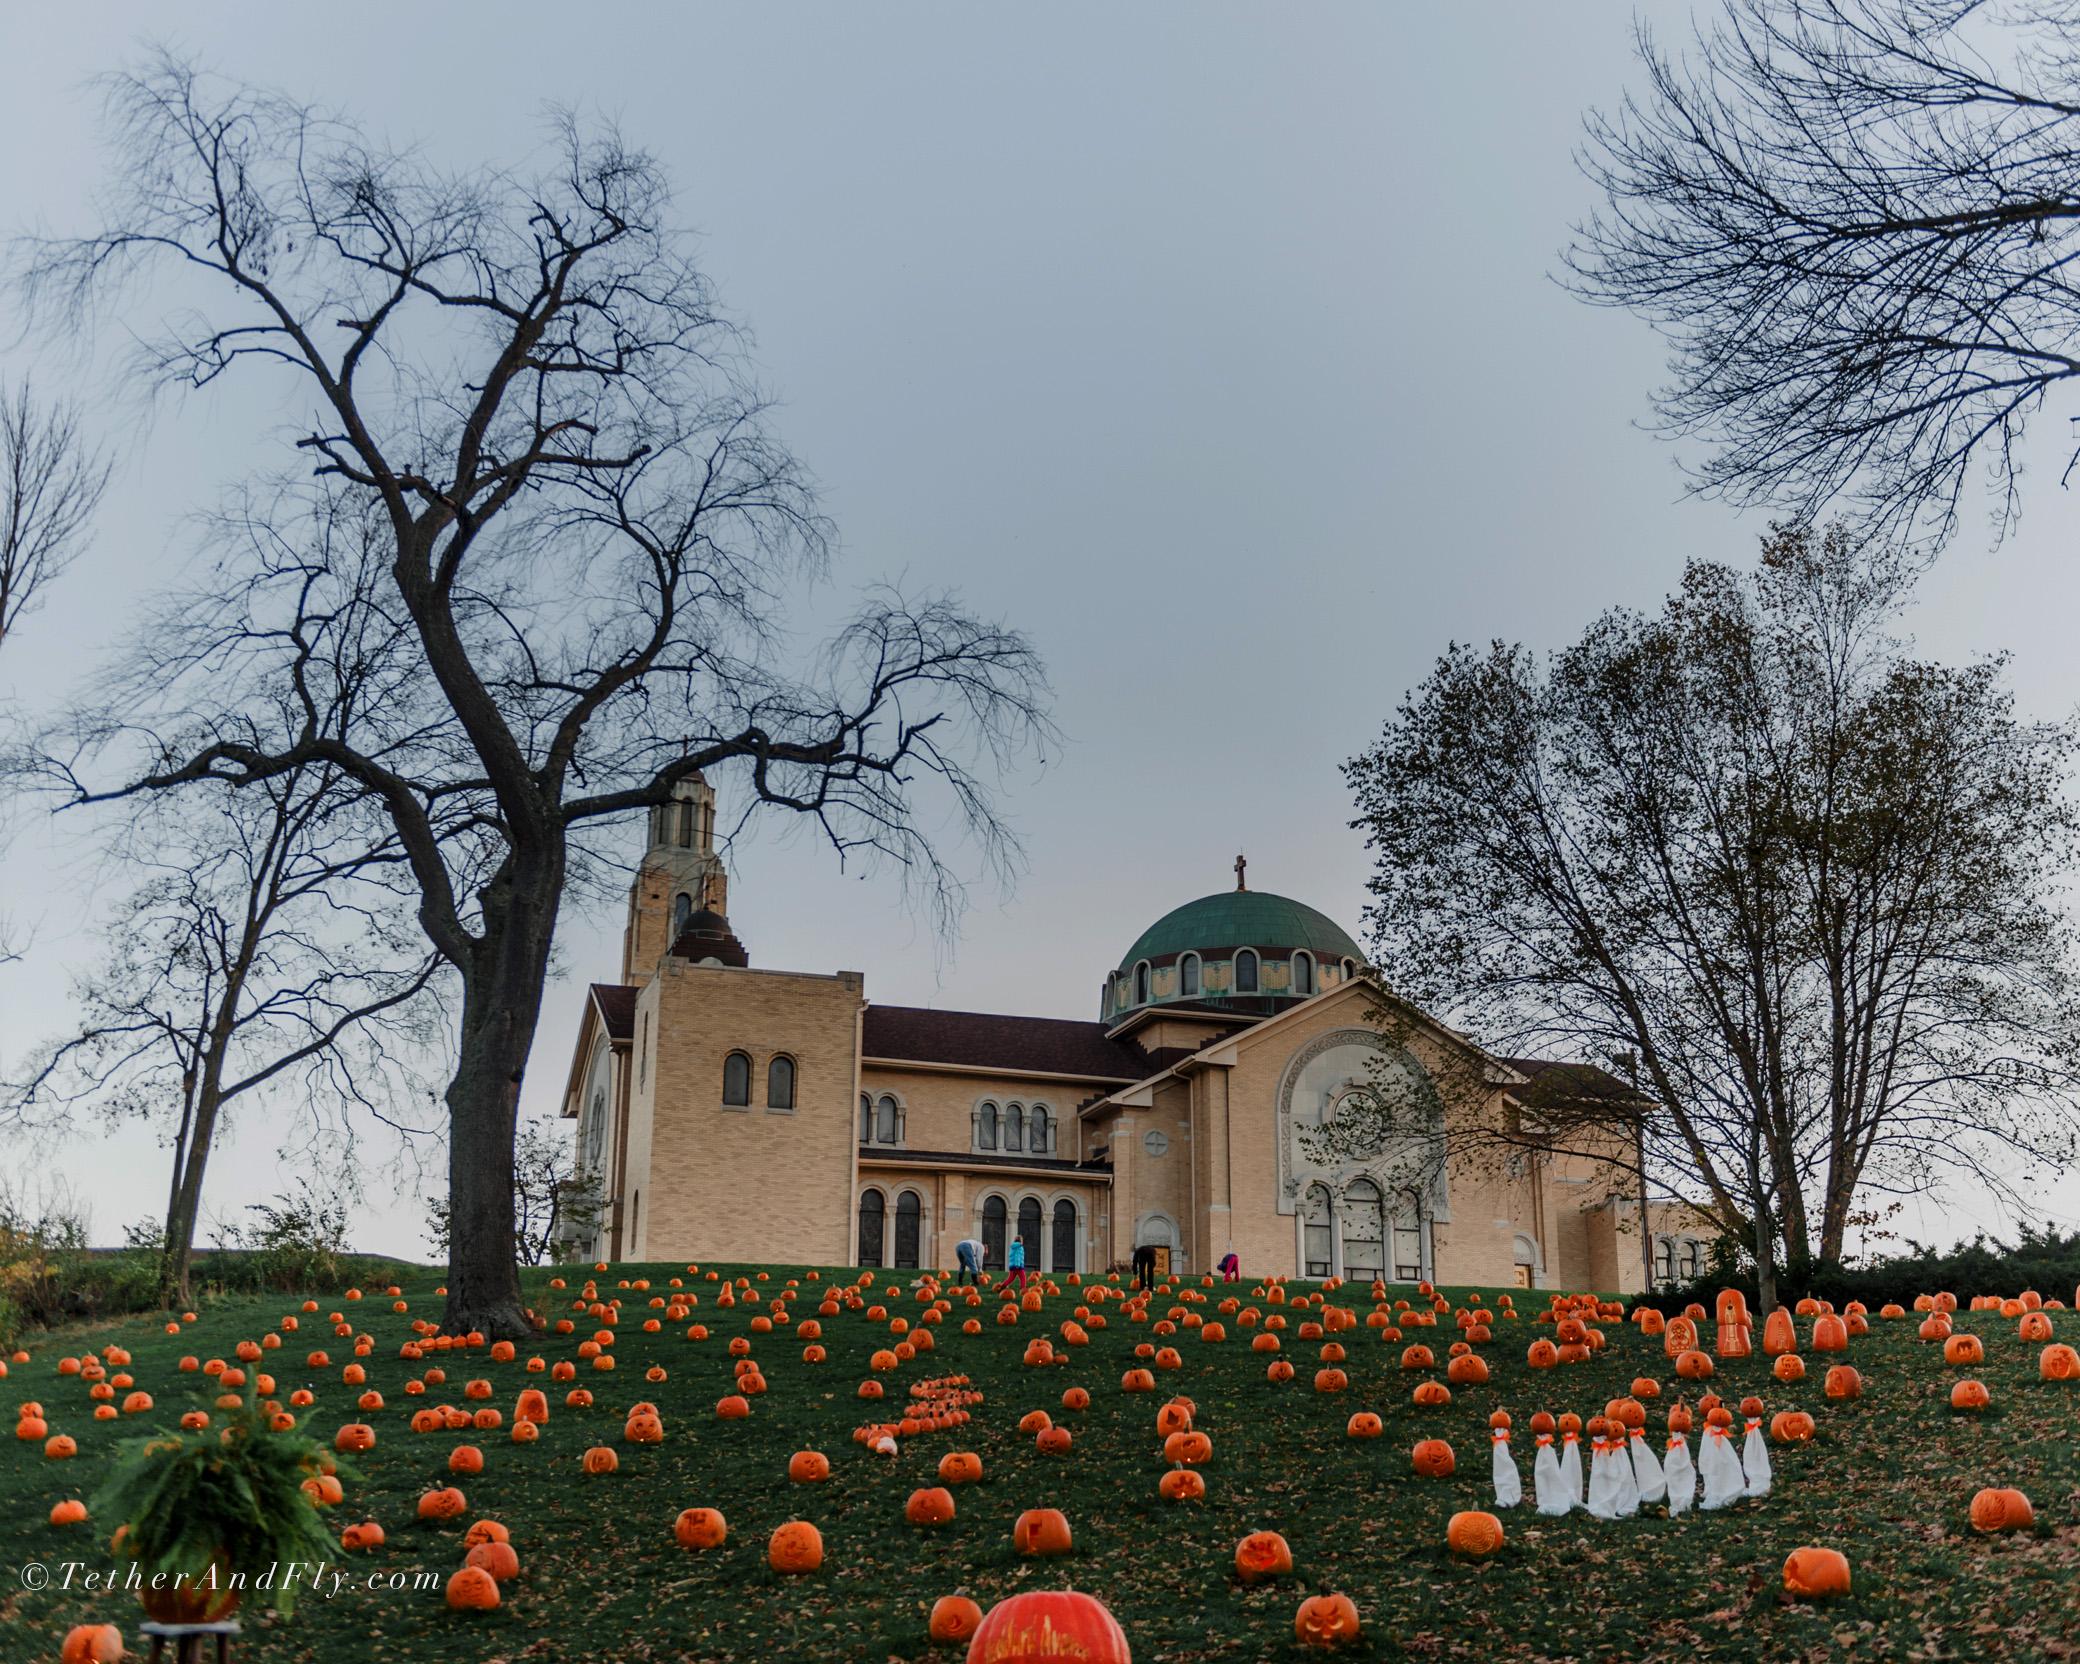 stoddard-pumpkin-glow-daytonohio-tether-and-fly9 copy.jpg